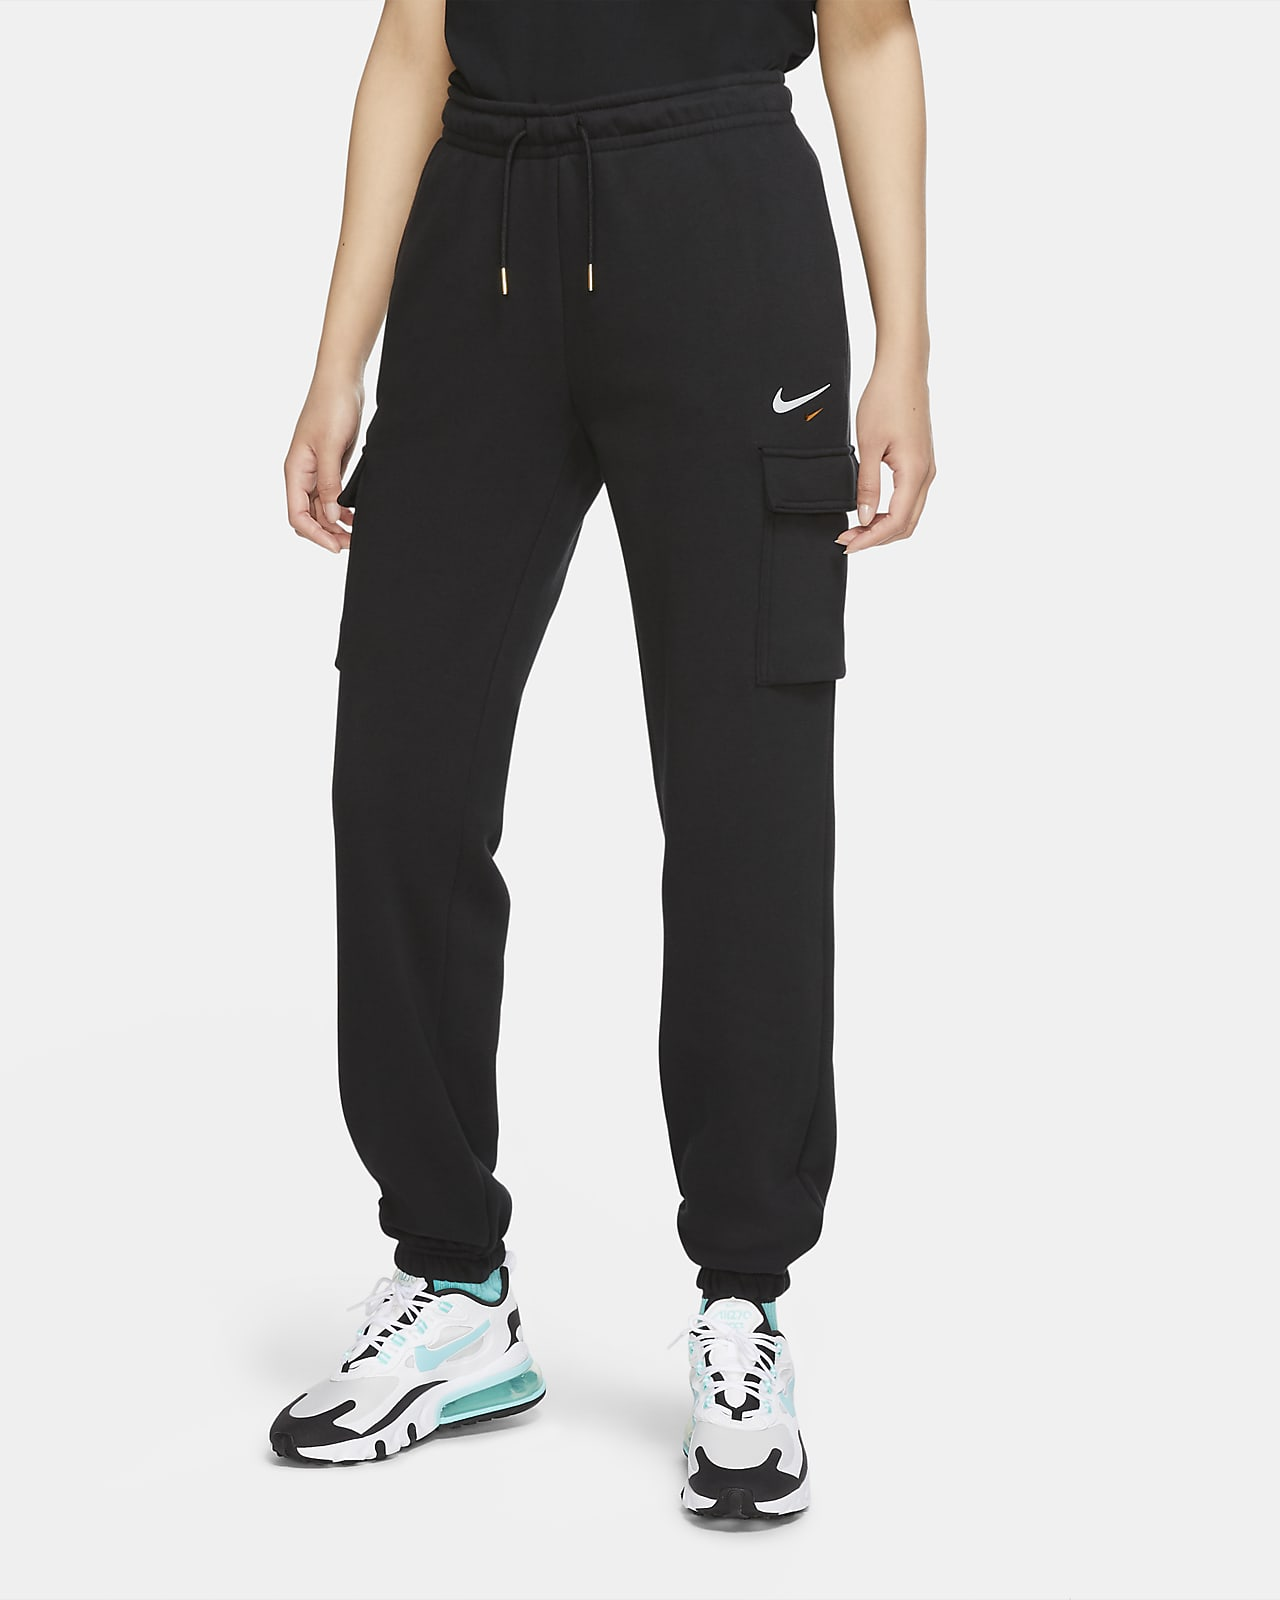 Pantalon cargo à coupe ample en tissu Fleece Nike Sportswear pour Femme